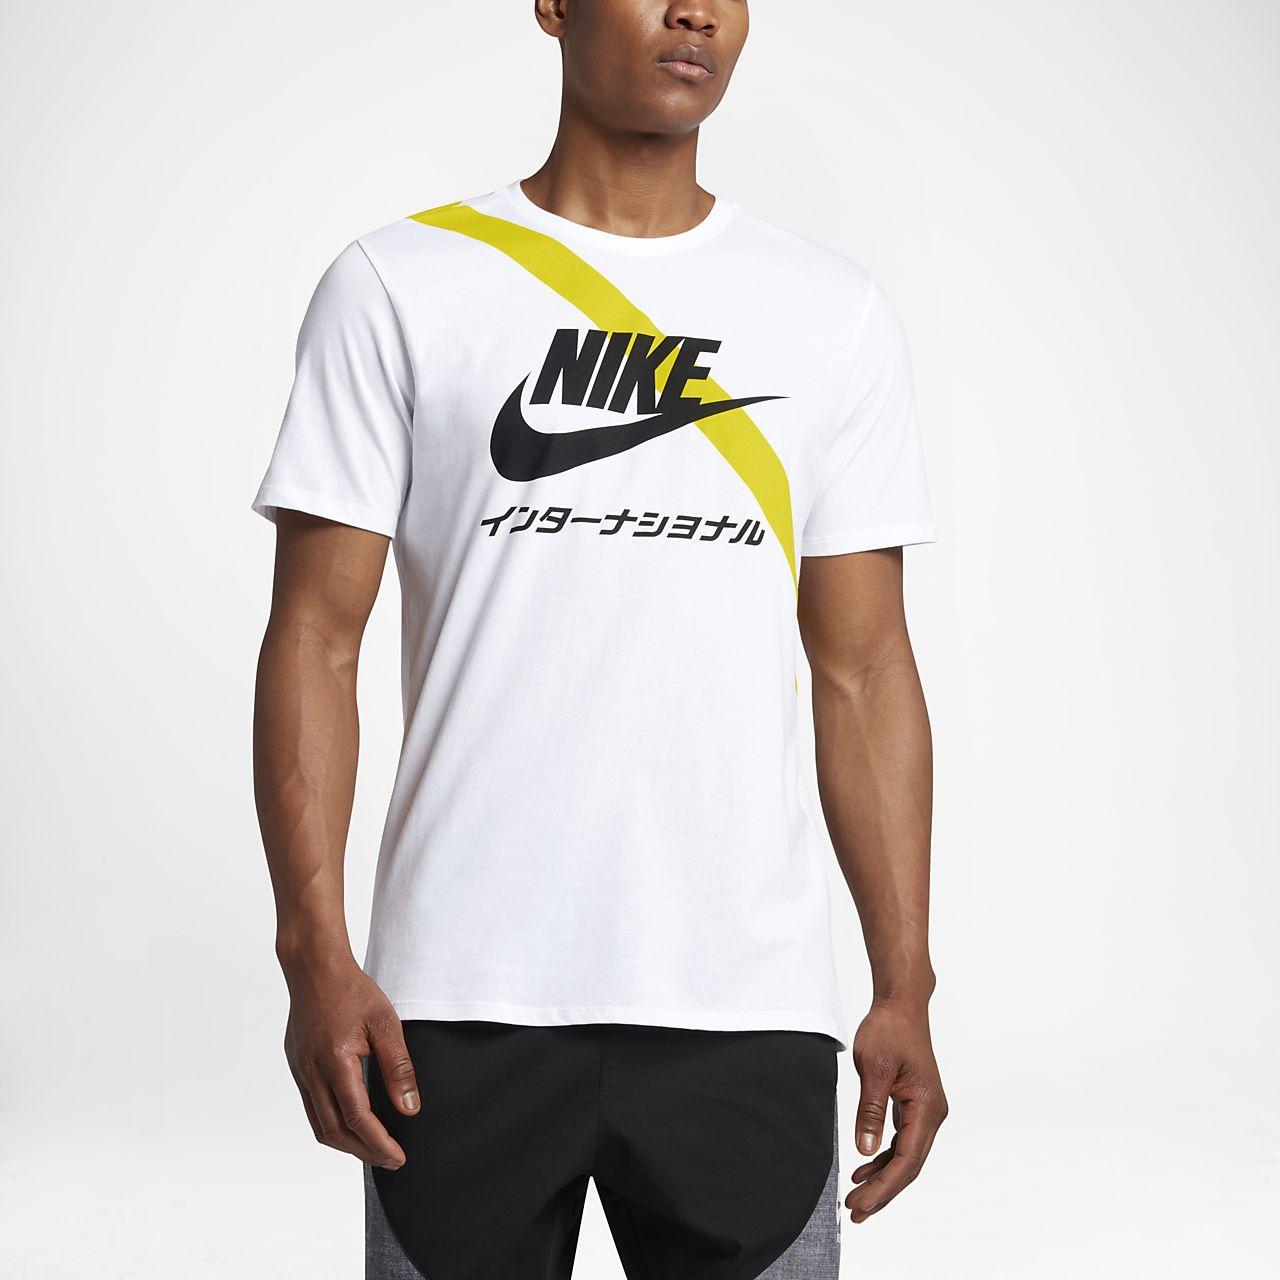 Nike International Men's T-Shirts Black/White